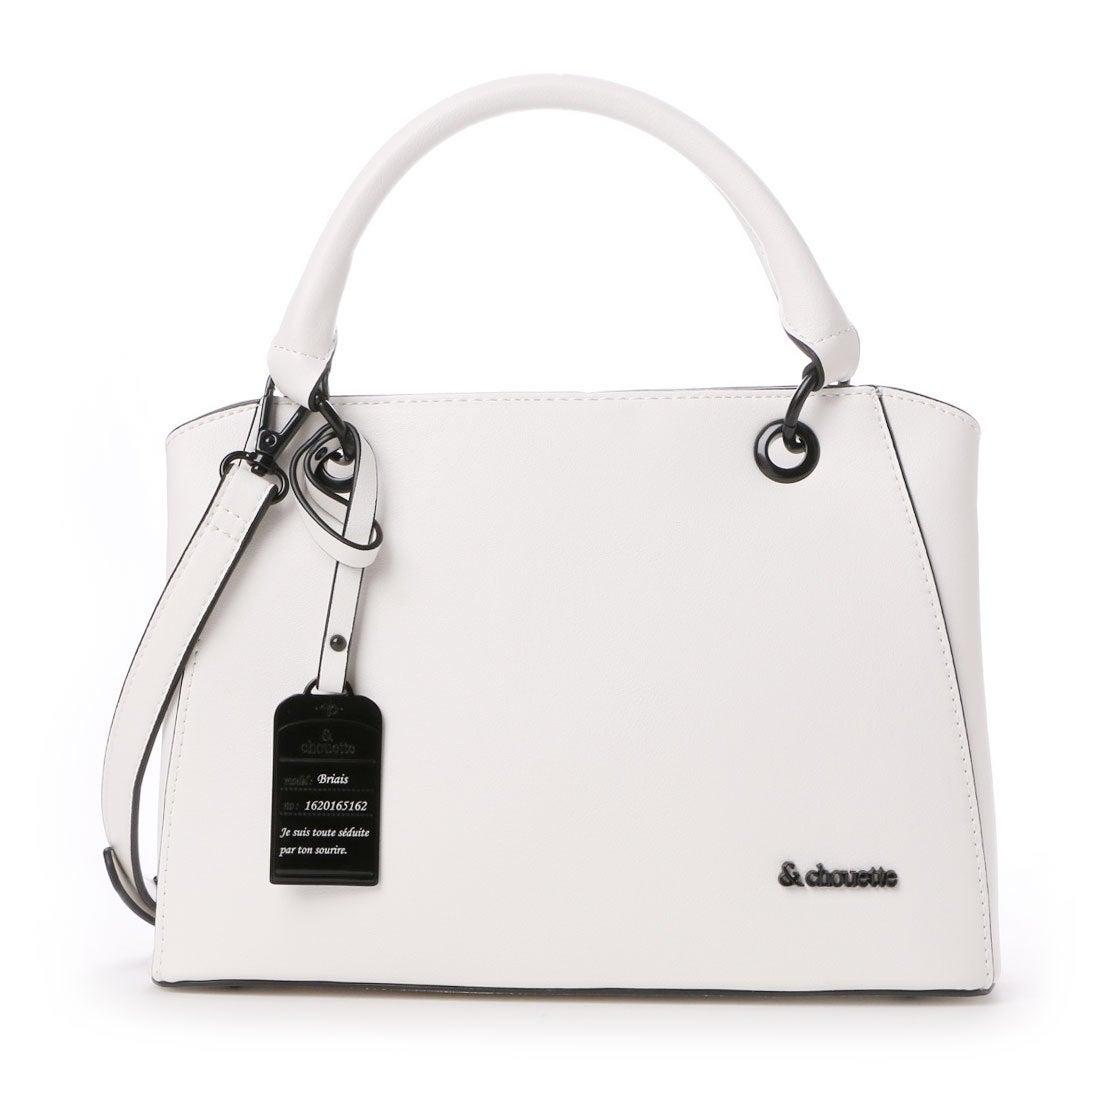 f305a2c3de75 & chouette &シュエット ソフトフォルムハンドバッグ(S)(ホワイト) ホワイト -靴&ファッション通販 ロコンド〜自宅で試着、気軽に返品